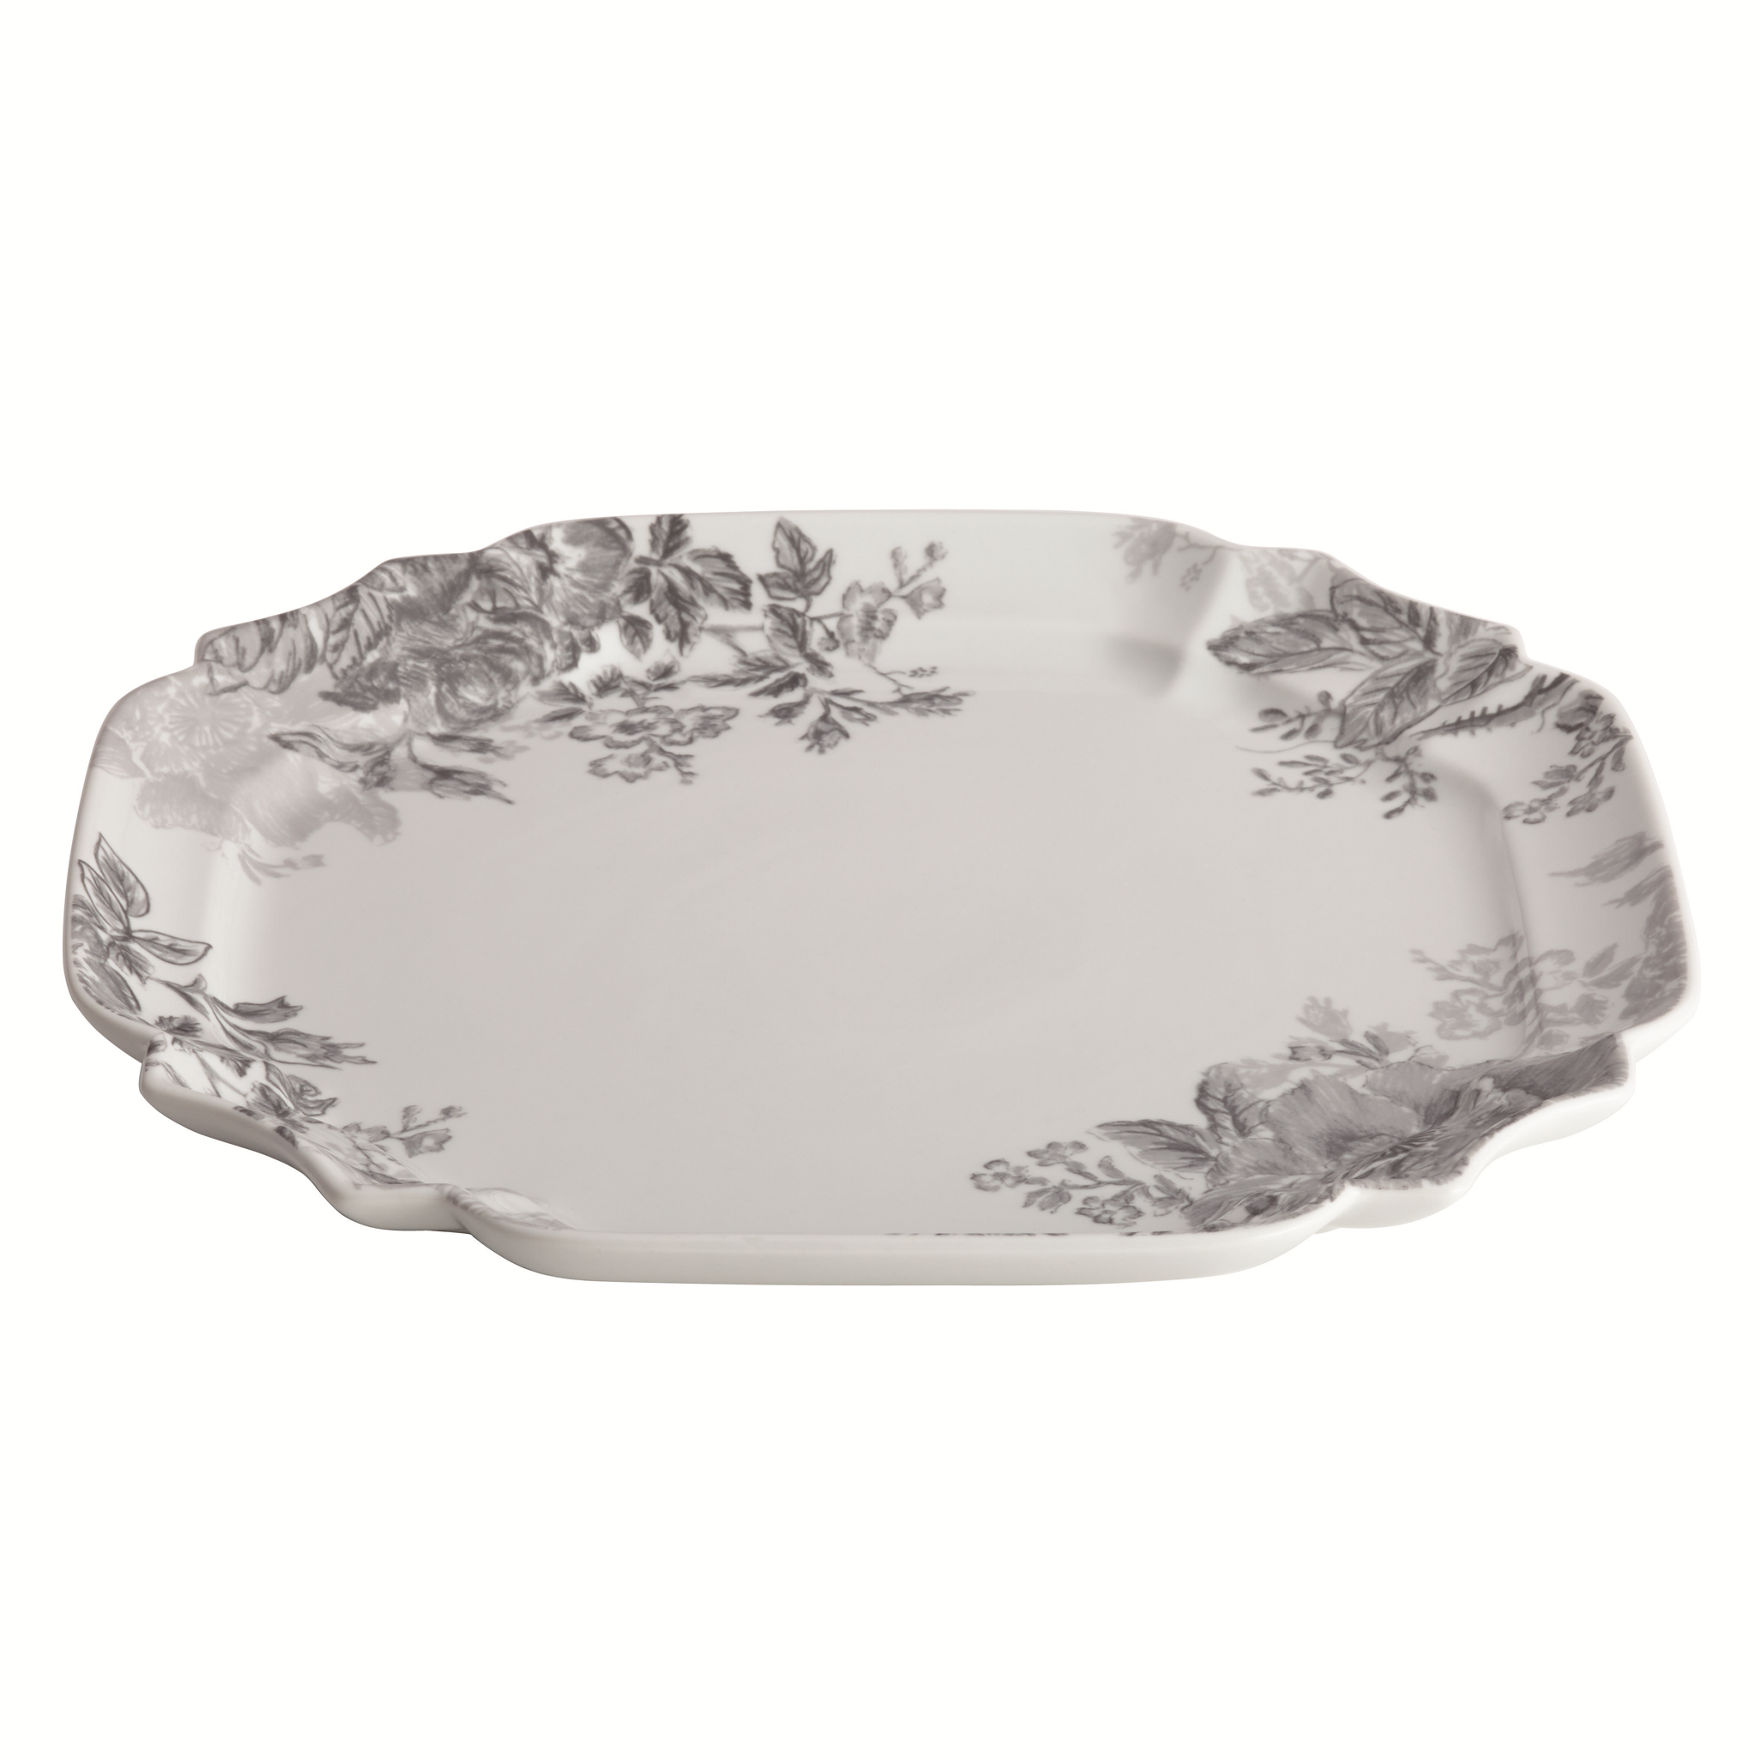 Farberware Green Serving Platters & Trays Serveware